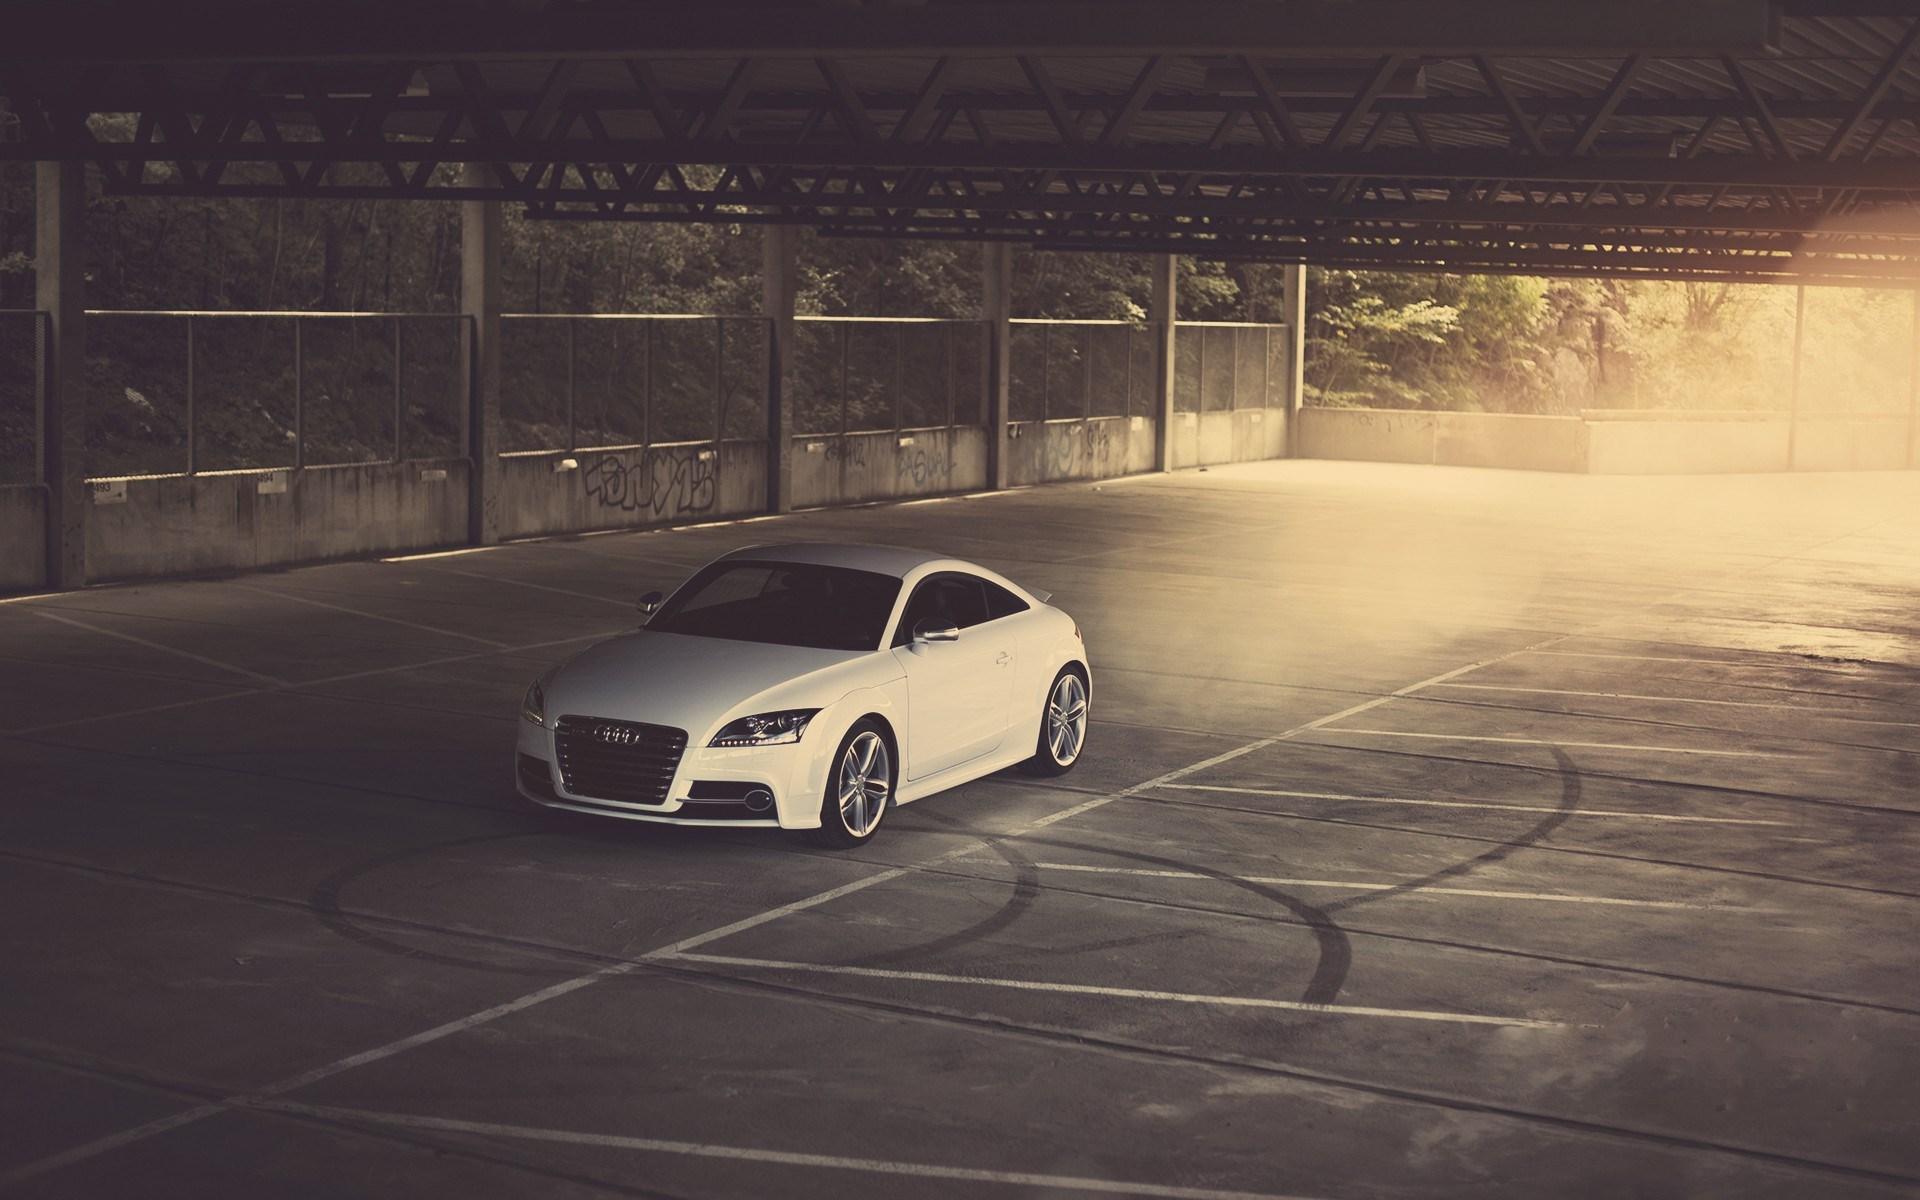 Download Audi R8 Desktop Wallpaper 49362 1920x1080 px High ...